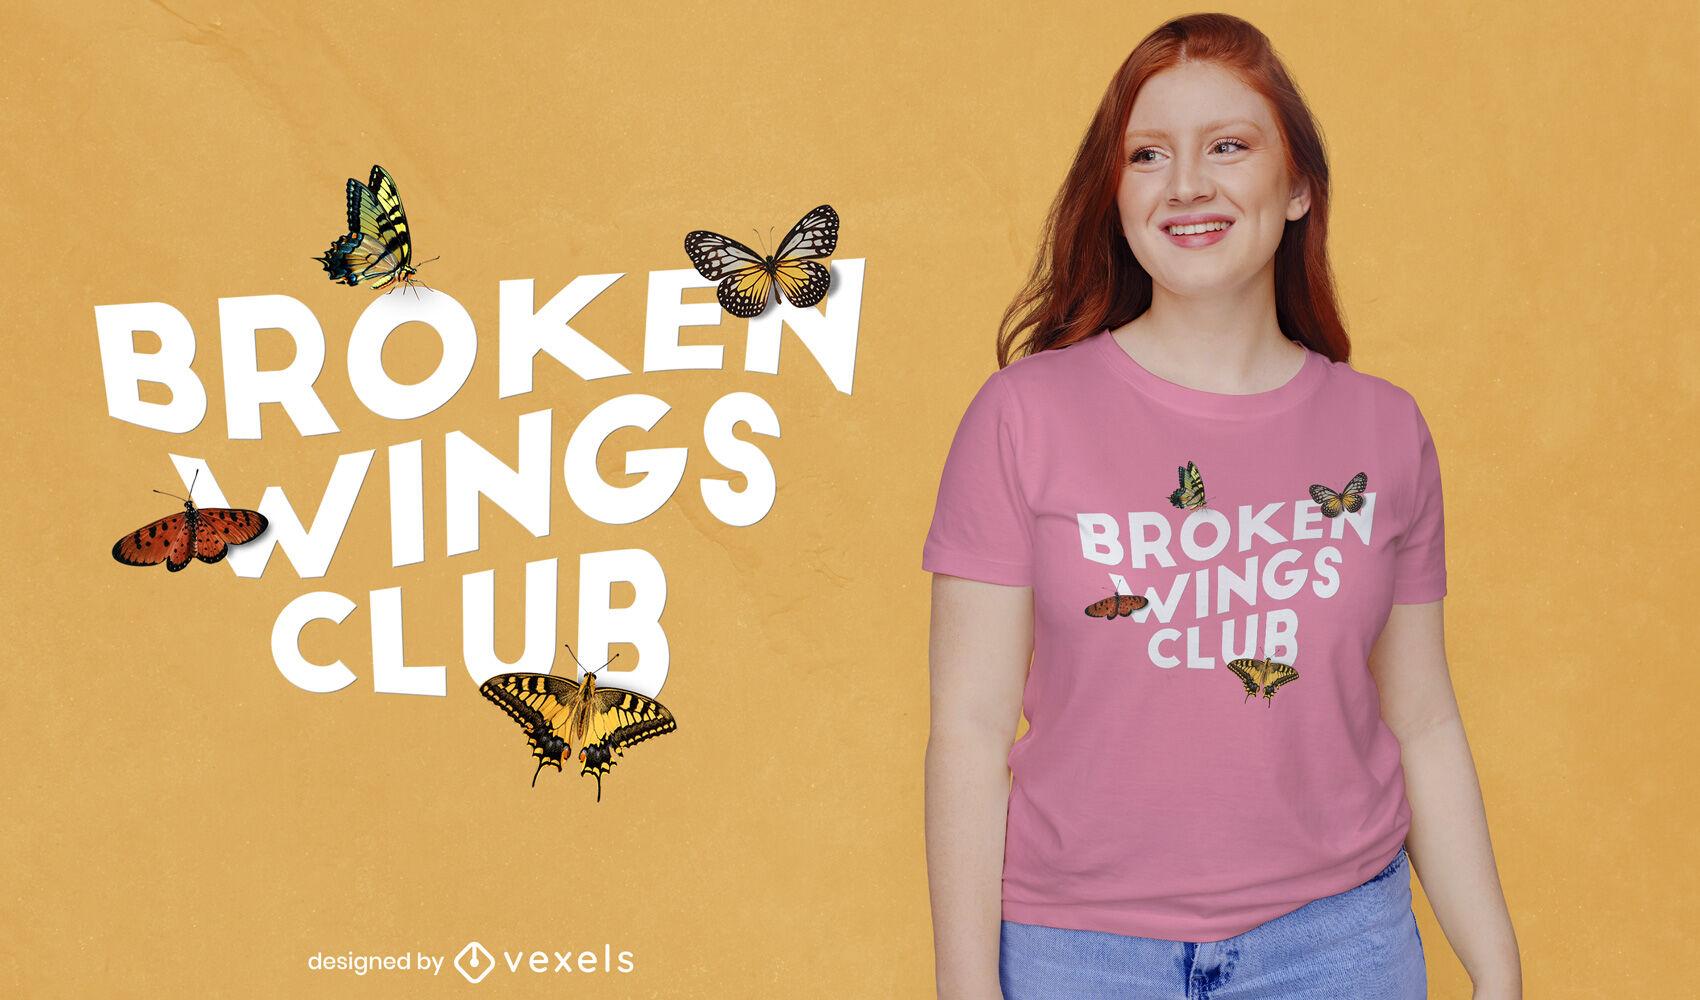 Diseño de camiseta psd de mariposas de club de alas rotas